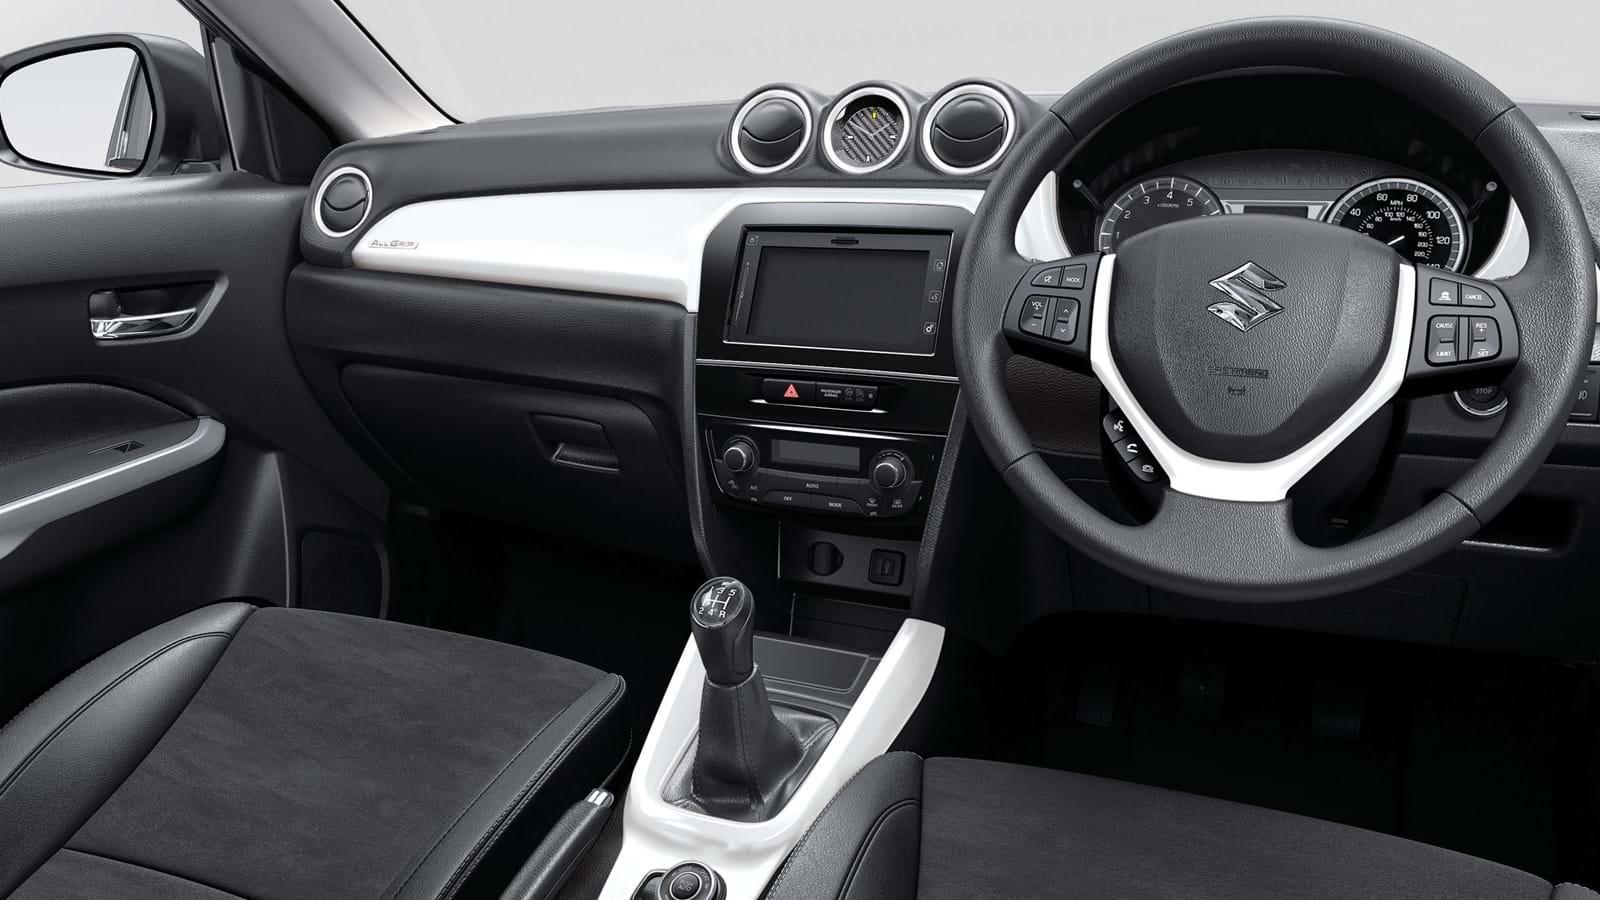 Superior White interior personalisation pack